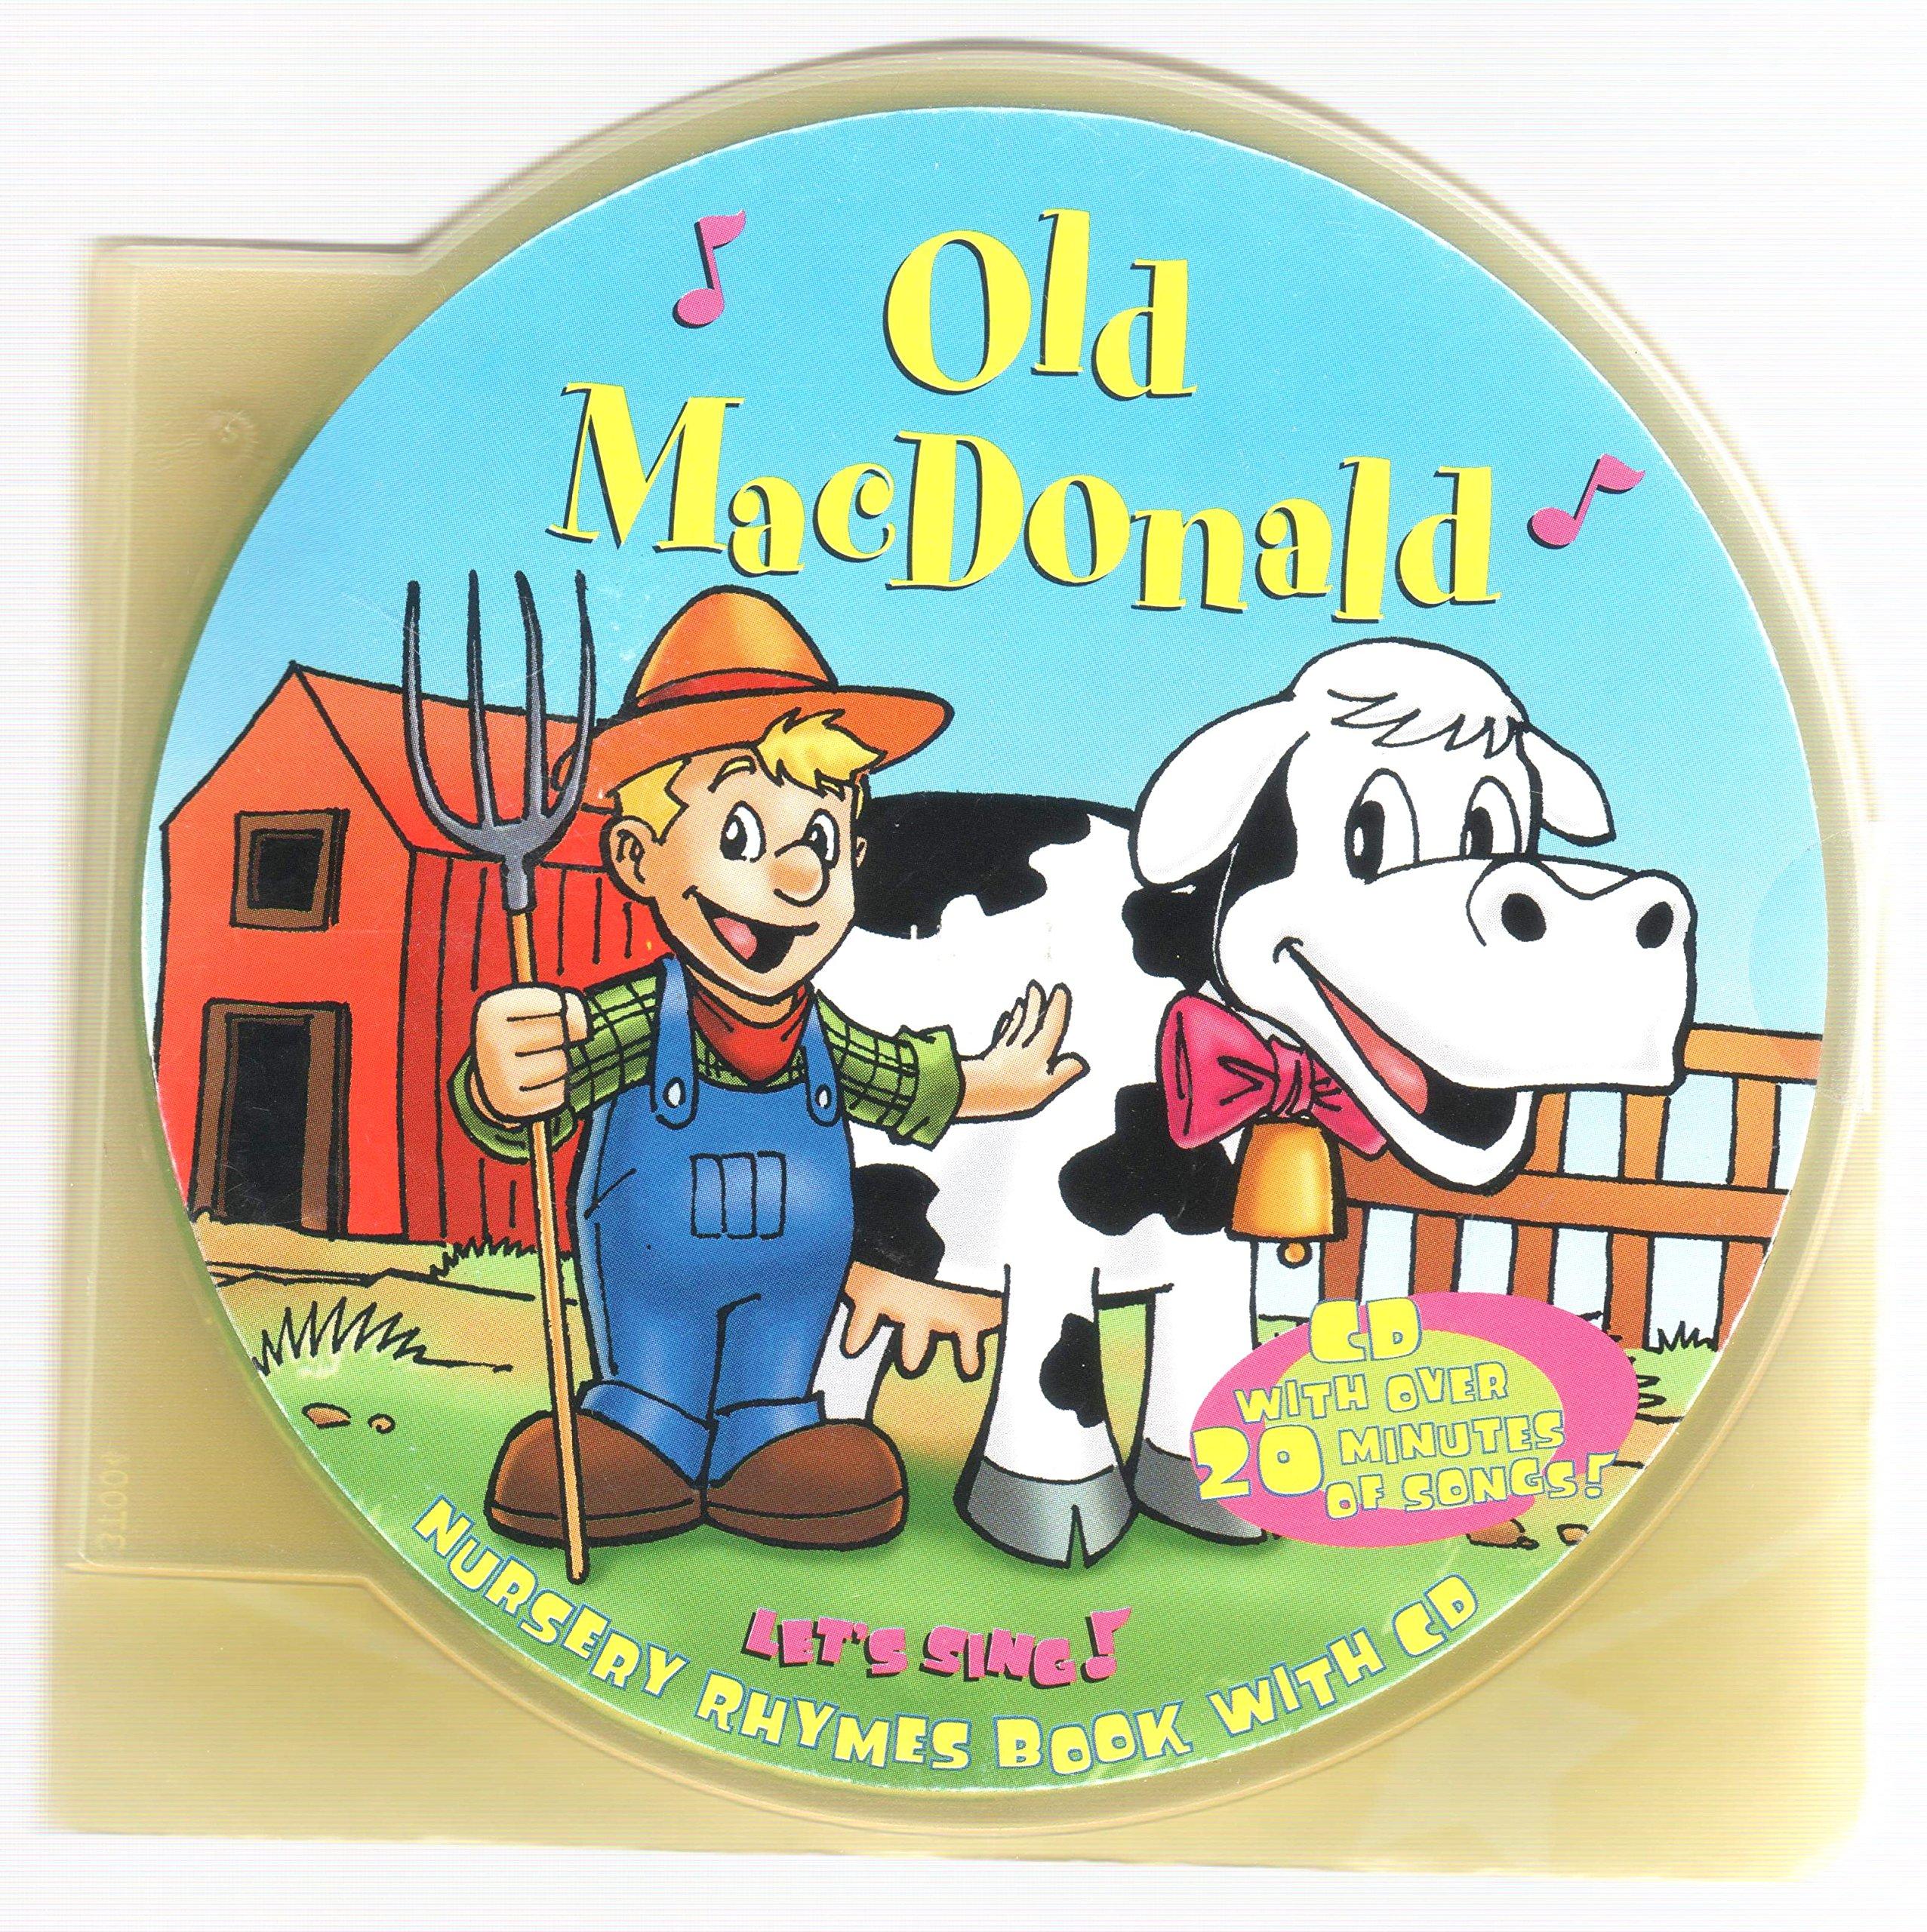 Old Macdonald Nursery Rhymes Book with Cd PDF